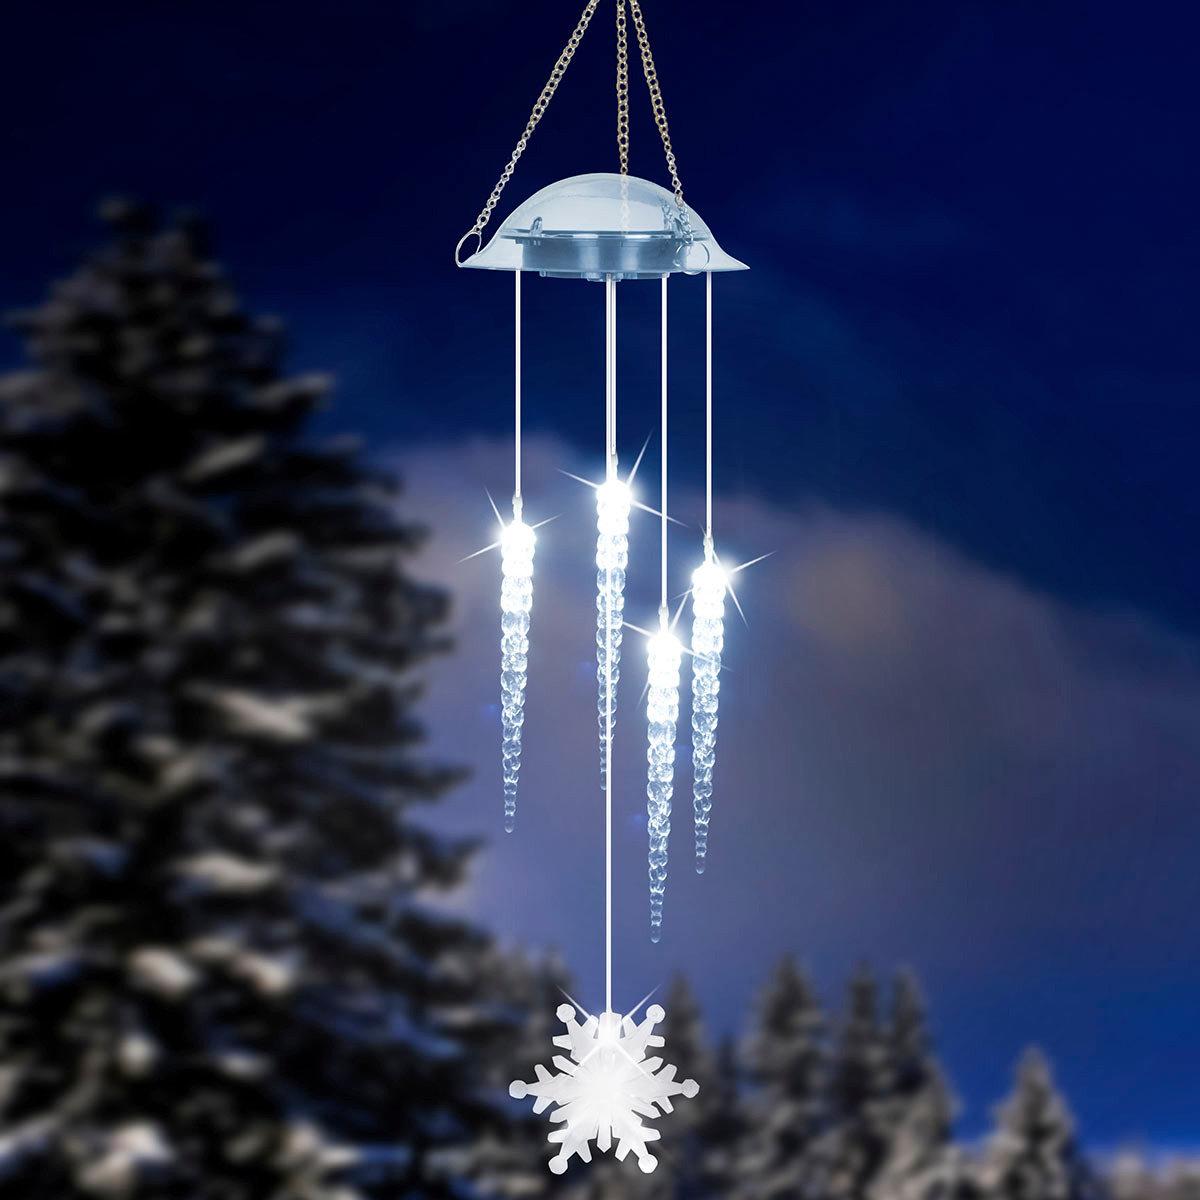 solar led windspiel eiszauber von g rtner p tschke. Black Bedroom Furniture Sets. Home Design Ideas